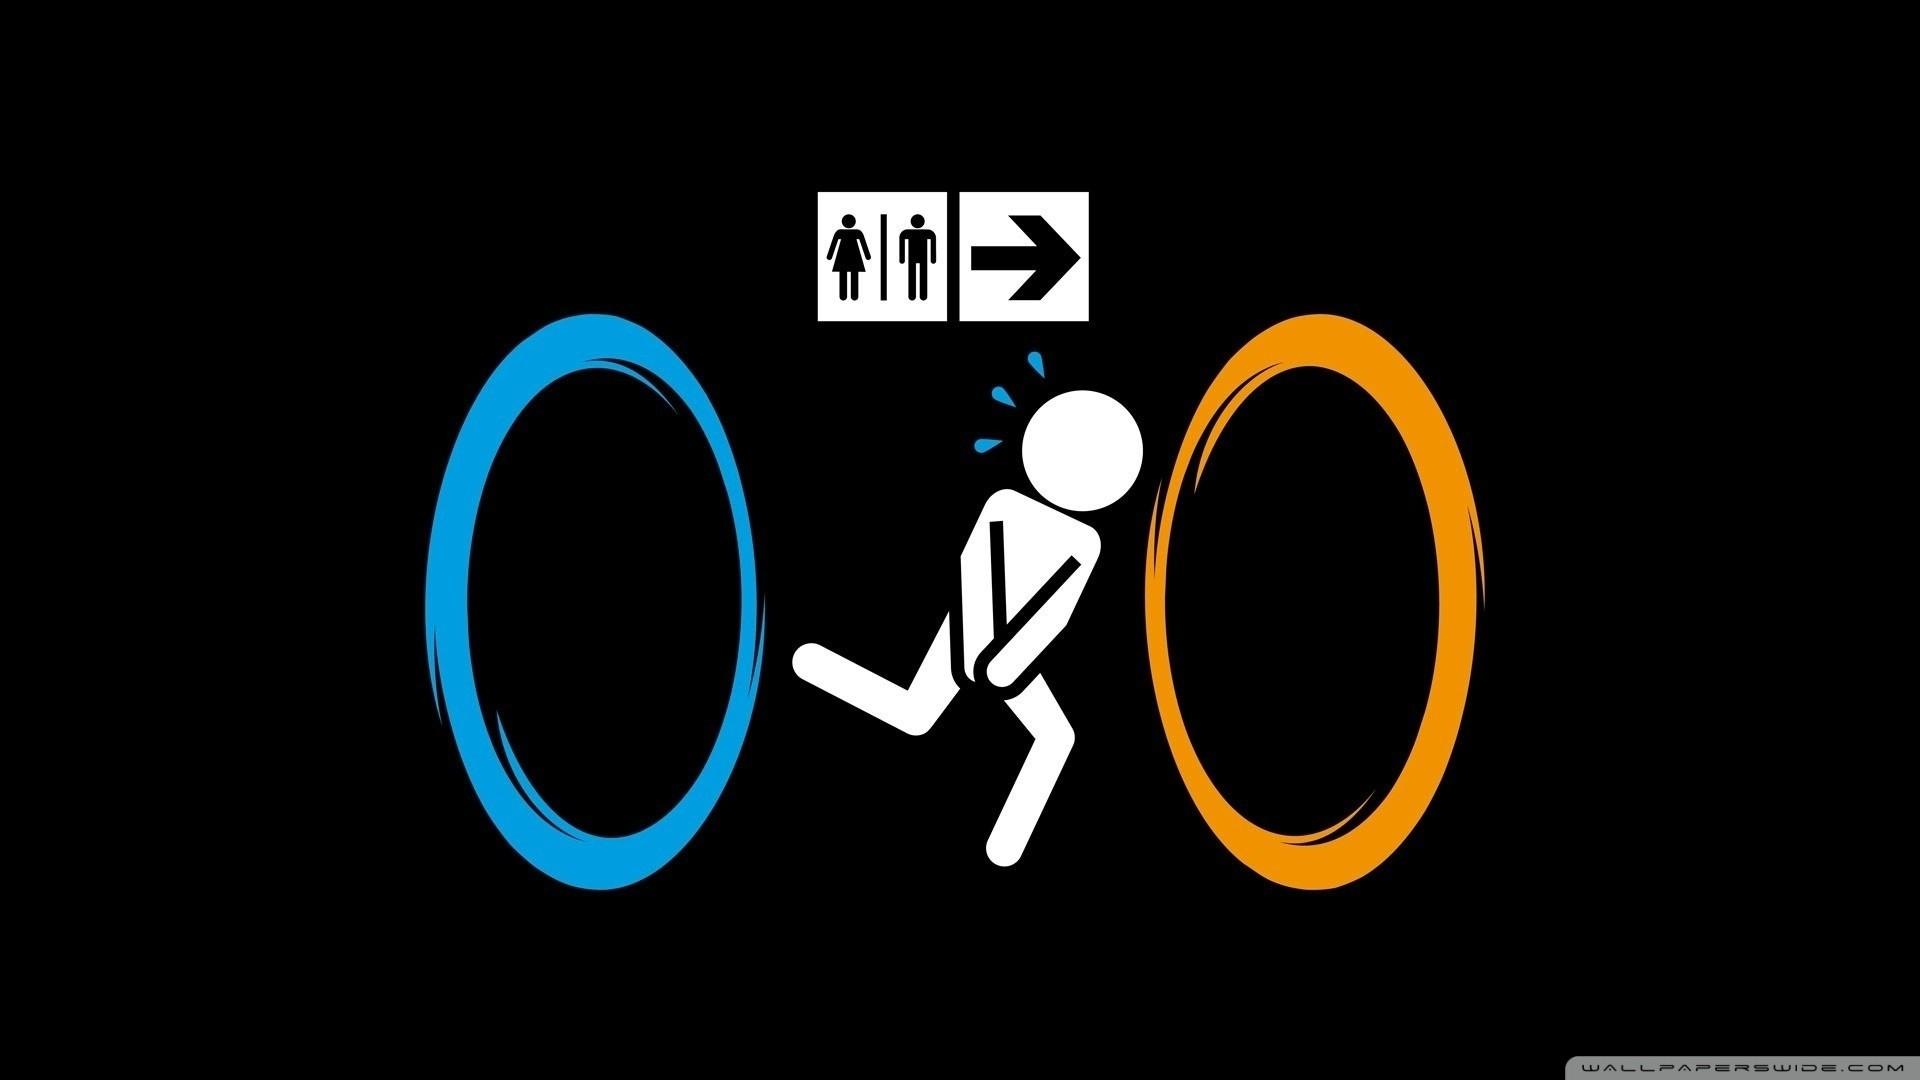 General 1920x1080 Portal (game) humor simple background black background minimalism video games Valve Portal 2 memes